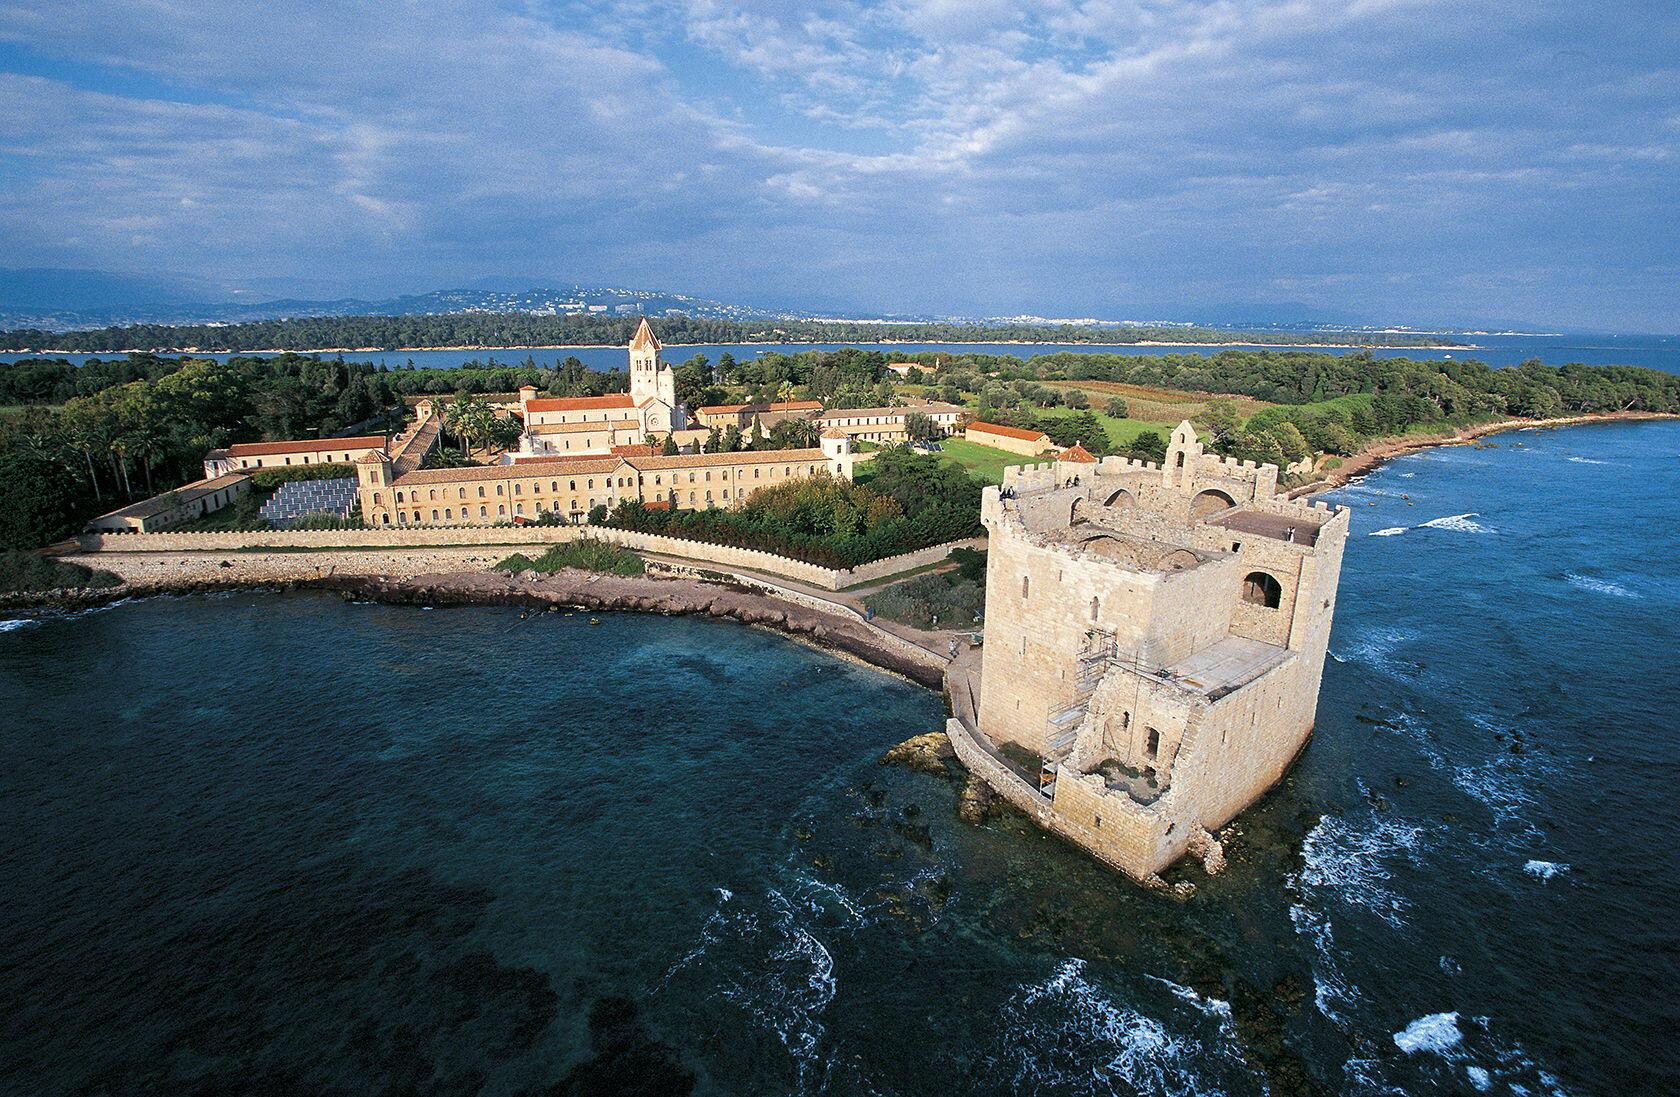 Panorama Abbaye de Lerins Cote d'Azur L'ile Saint Honorat